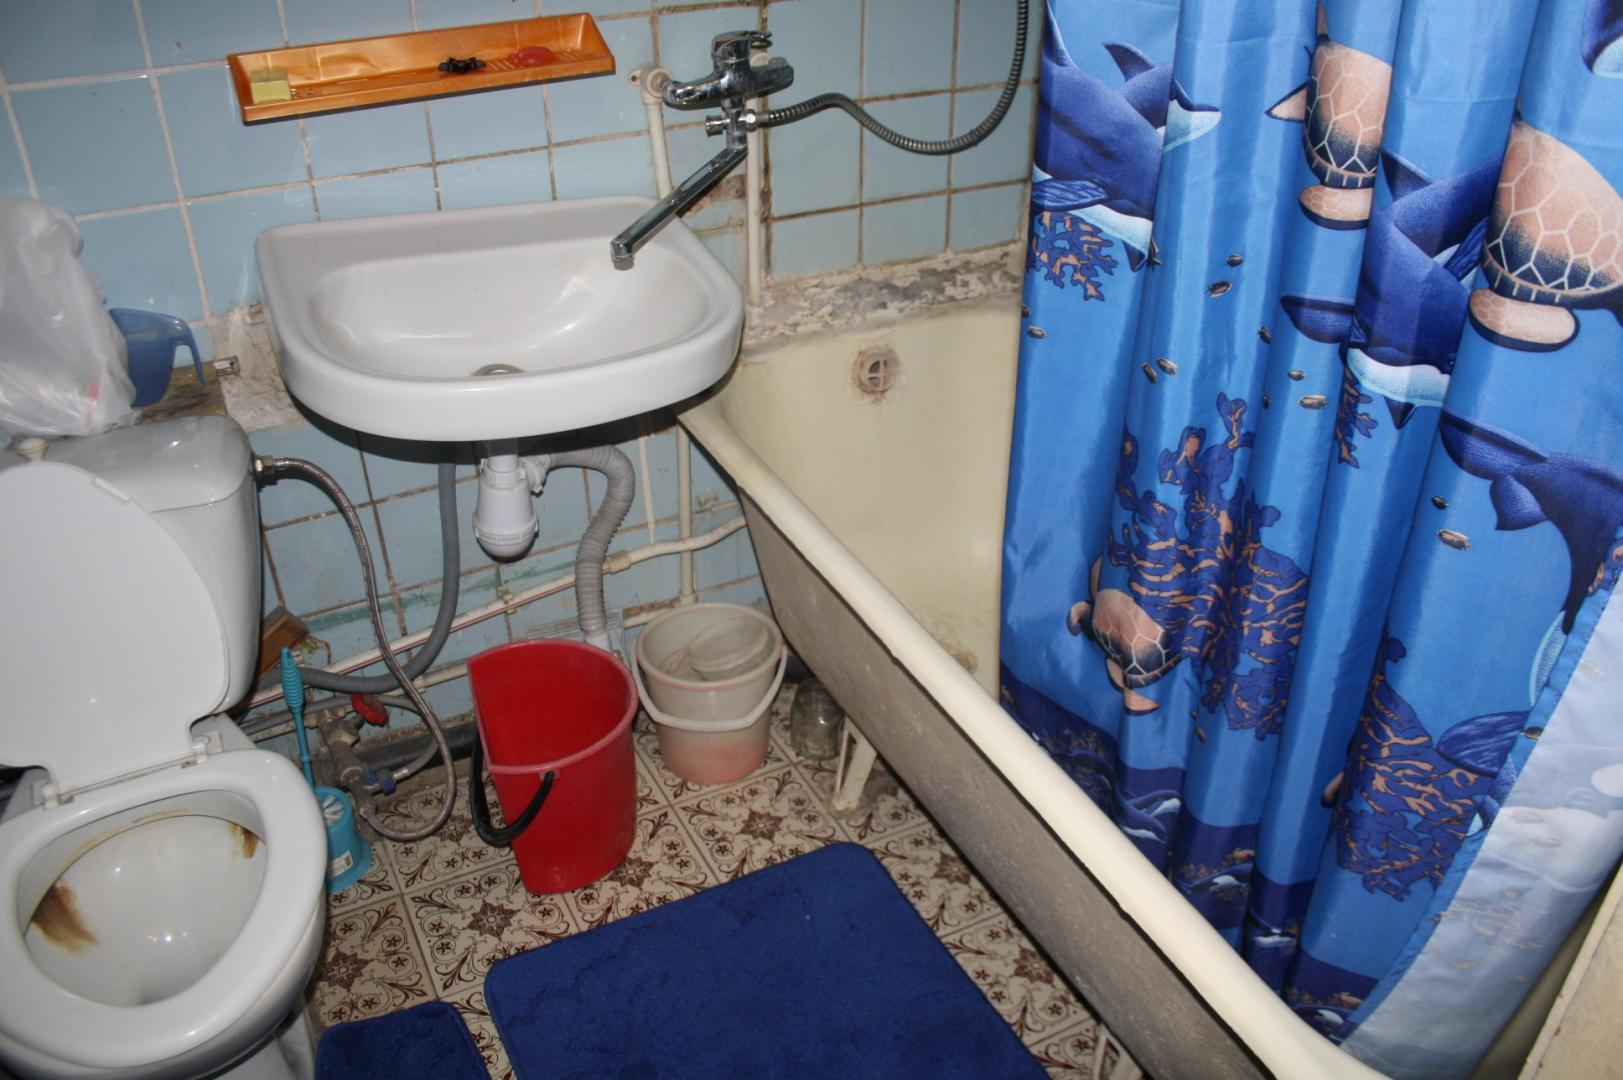 Квартира, 1 комната, 35 м² в Люберцах 89160792833 купить 5